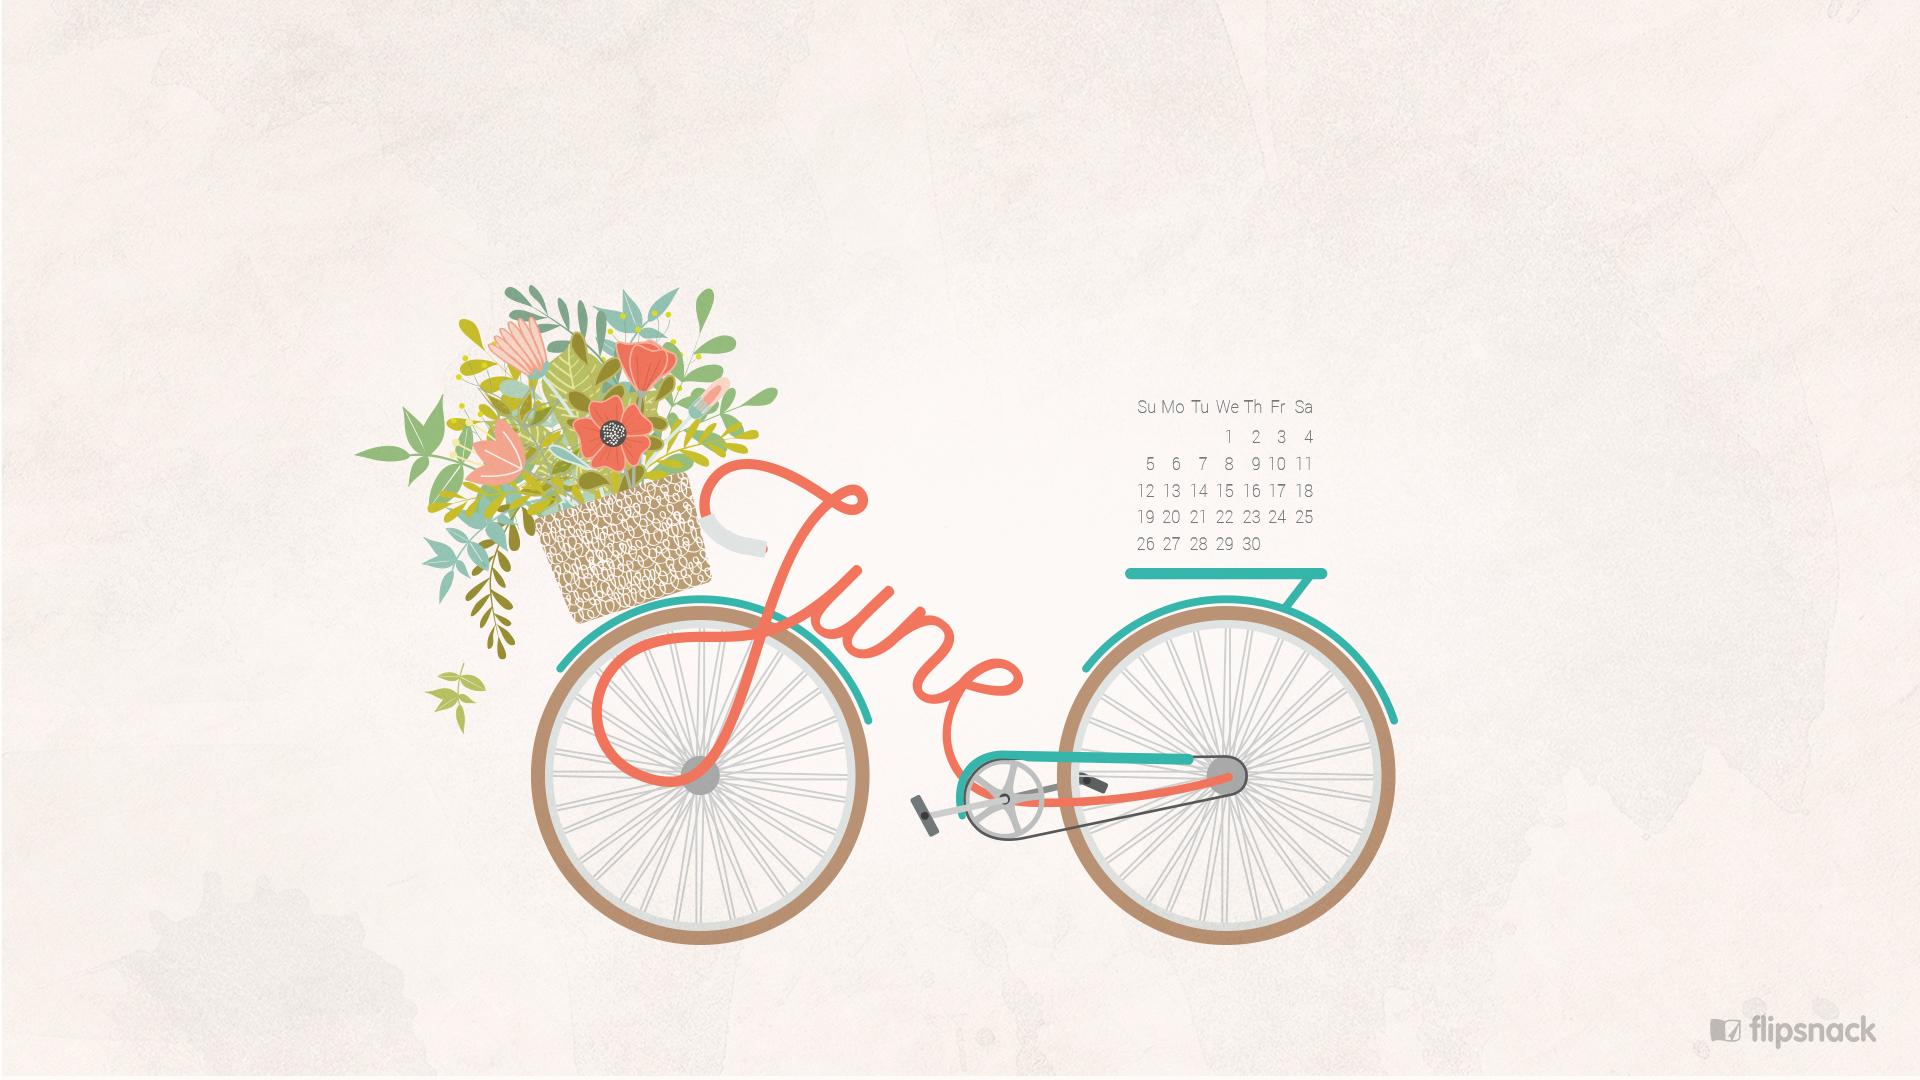 June 2017 Calendar HD Wallpaper Background Image 1920x1080 1920x1080